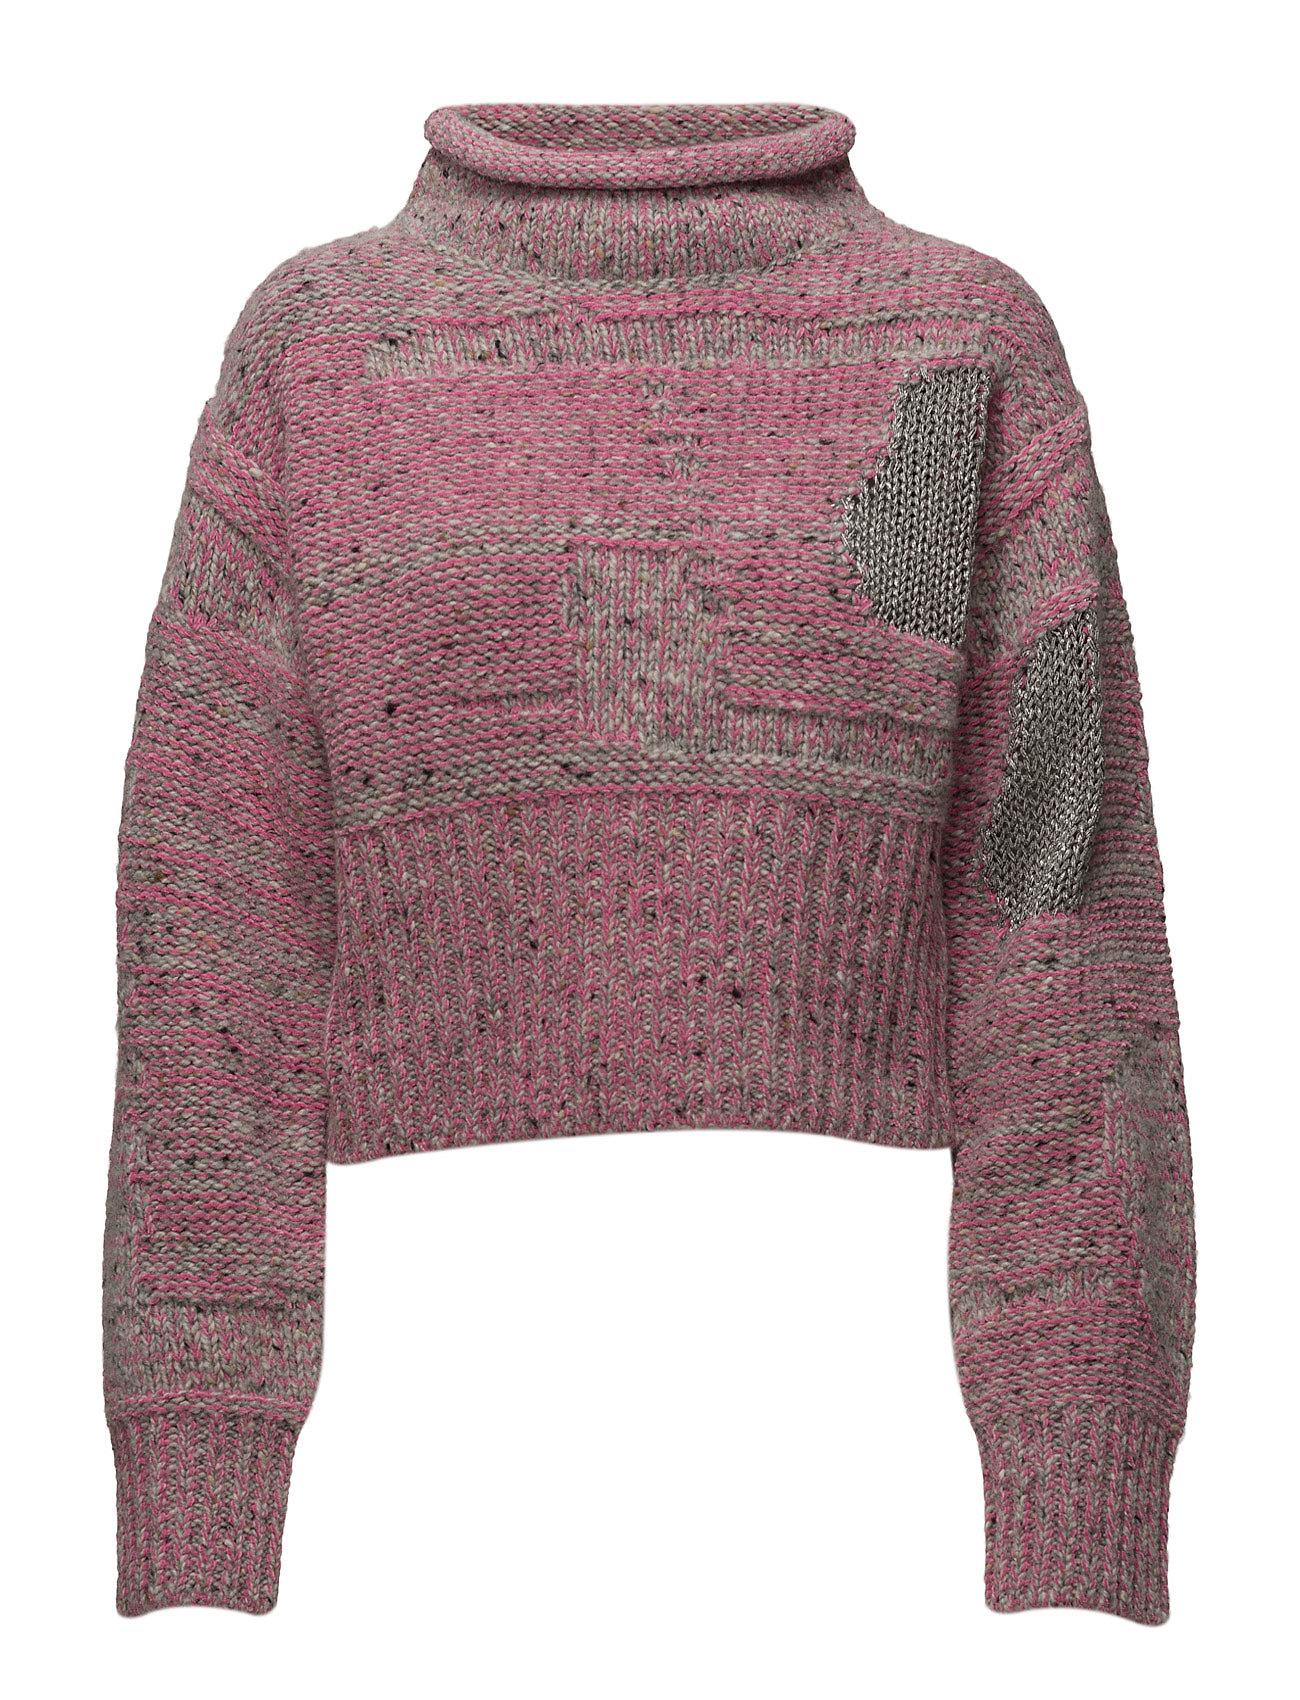 3.1 phillip lim – Ls plaited tweed cropped po på boozt.com dk